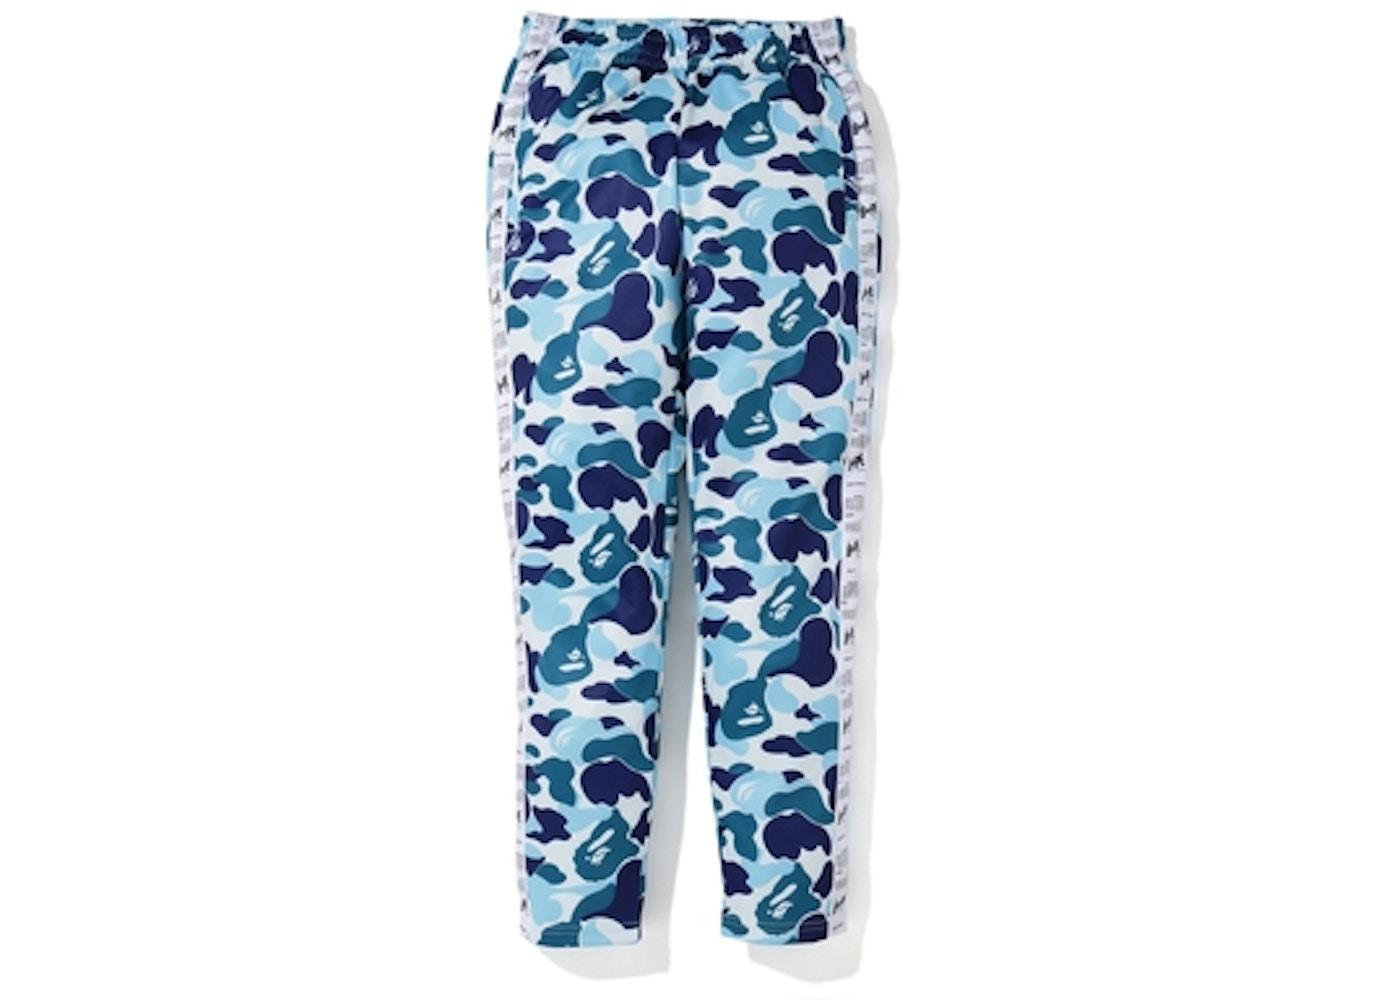 a7ee445f BAPE ABC Bapesta Tape Jersey Pants Blue. ABC Bapesta Tape Jersey